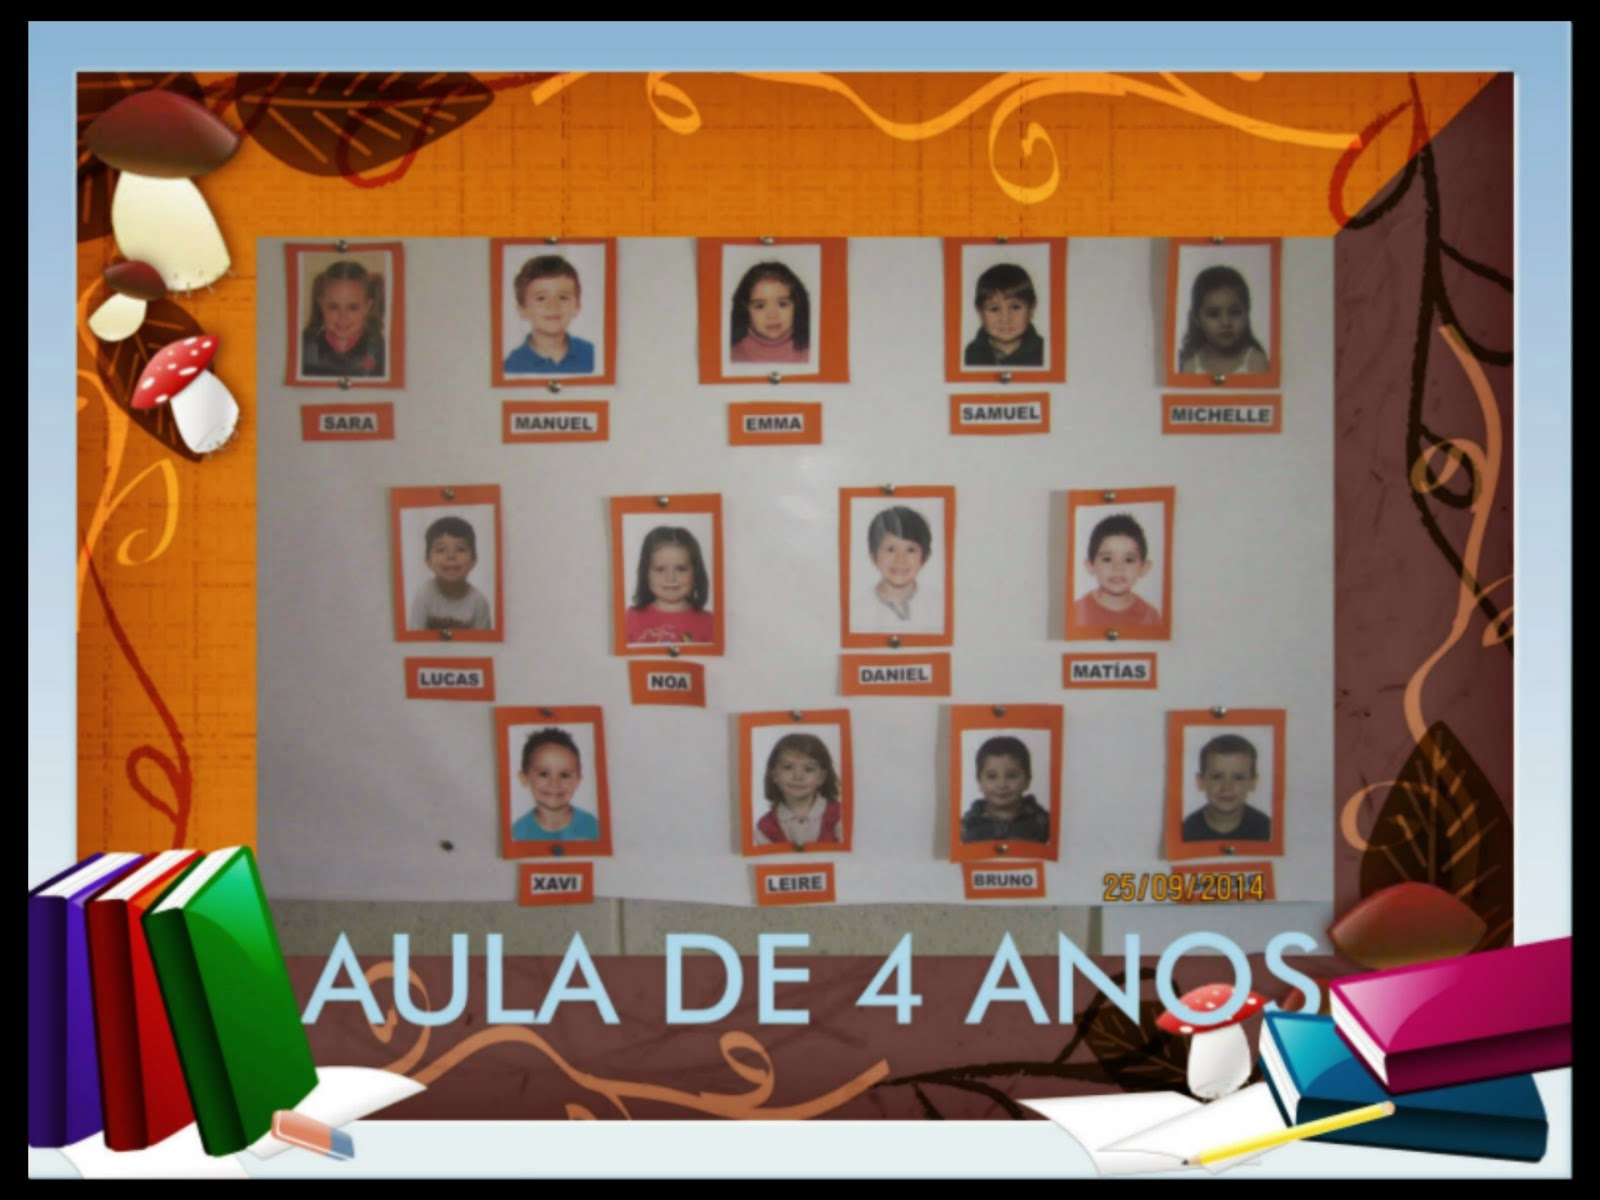 AULA DE 4 ANOS